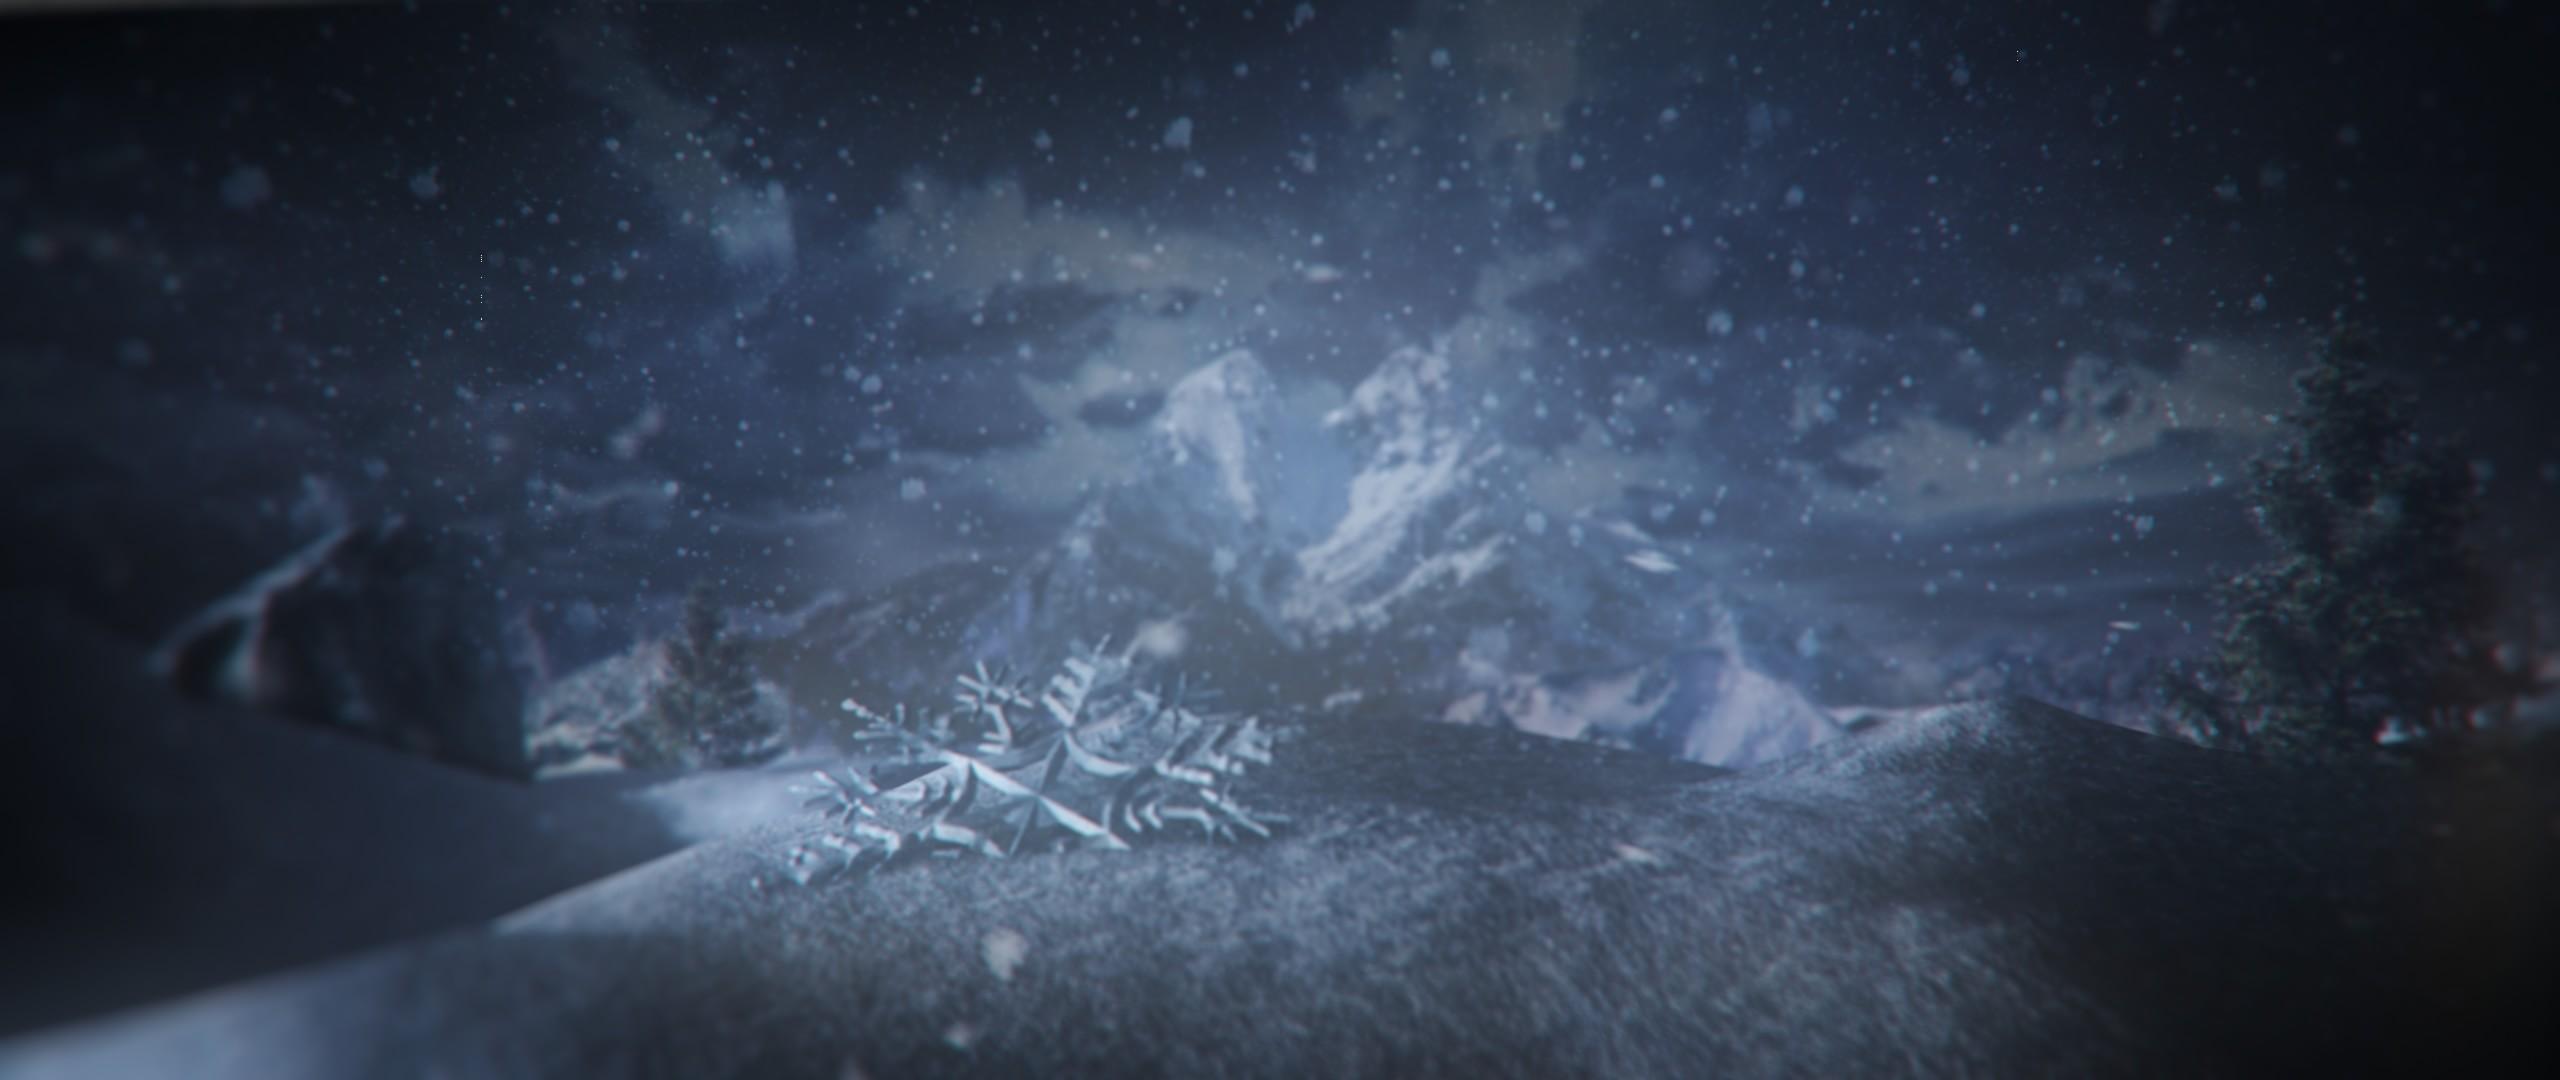 The fallen snowflake